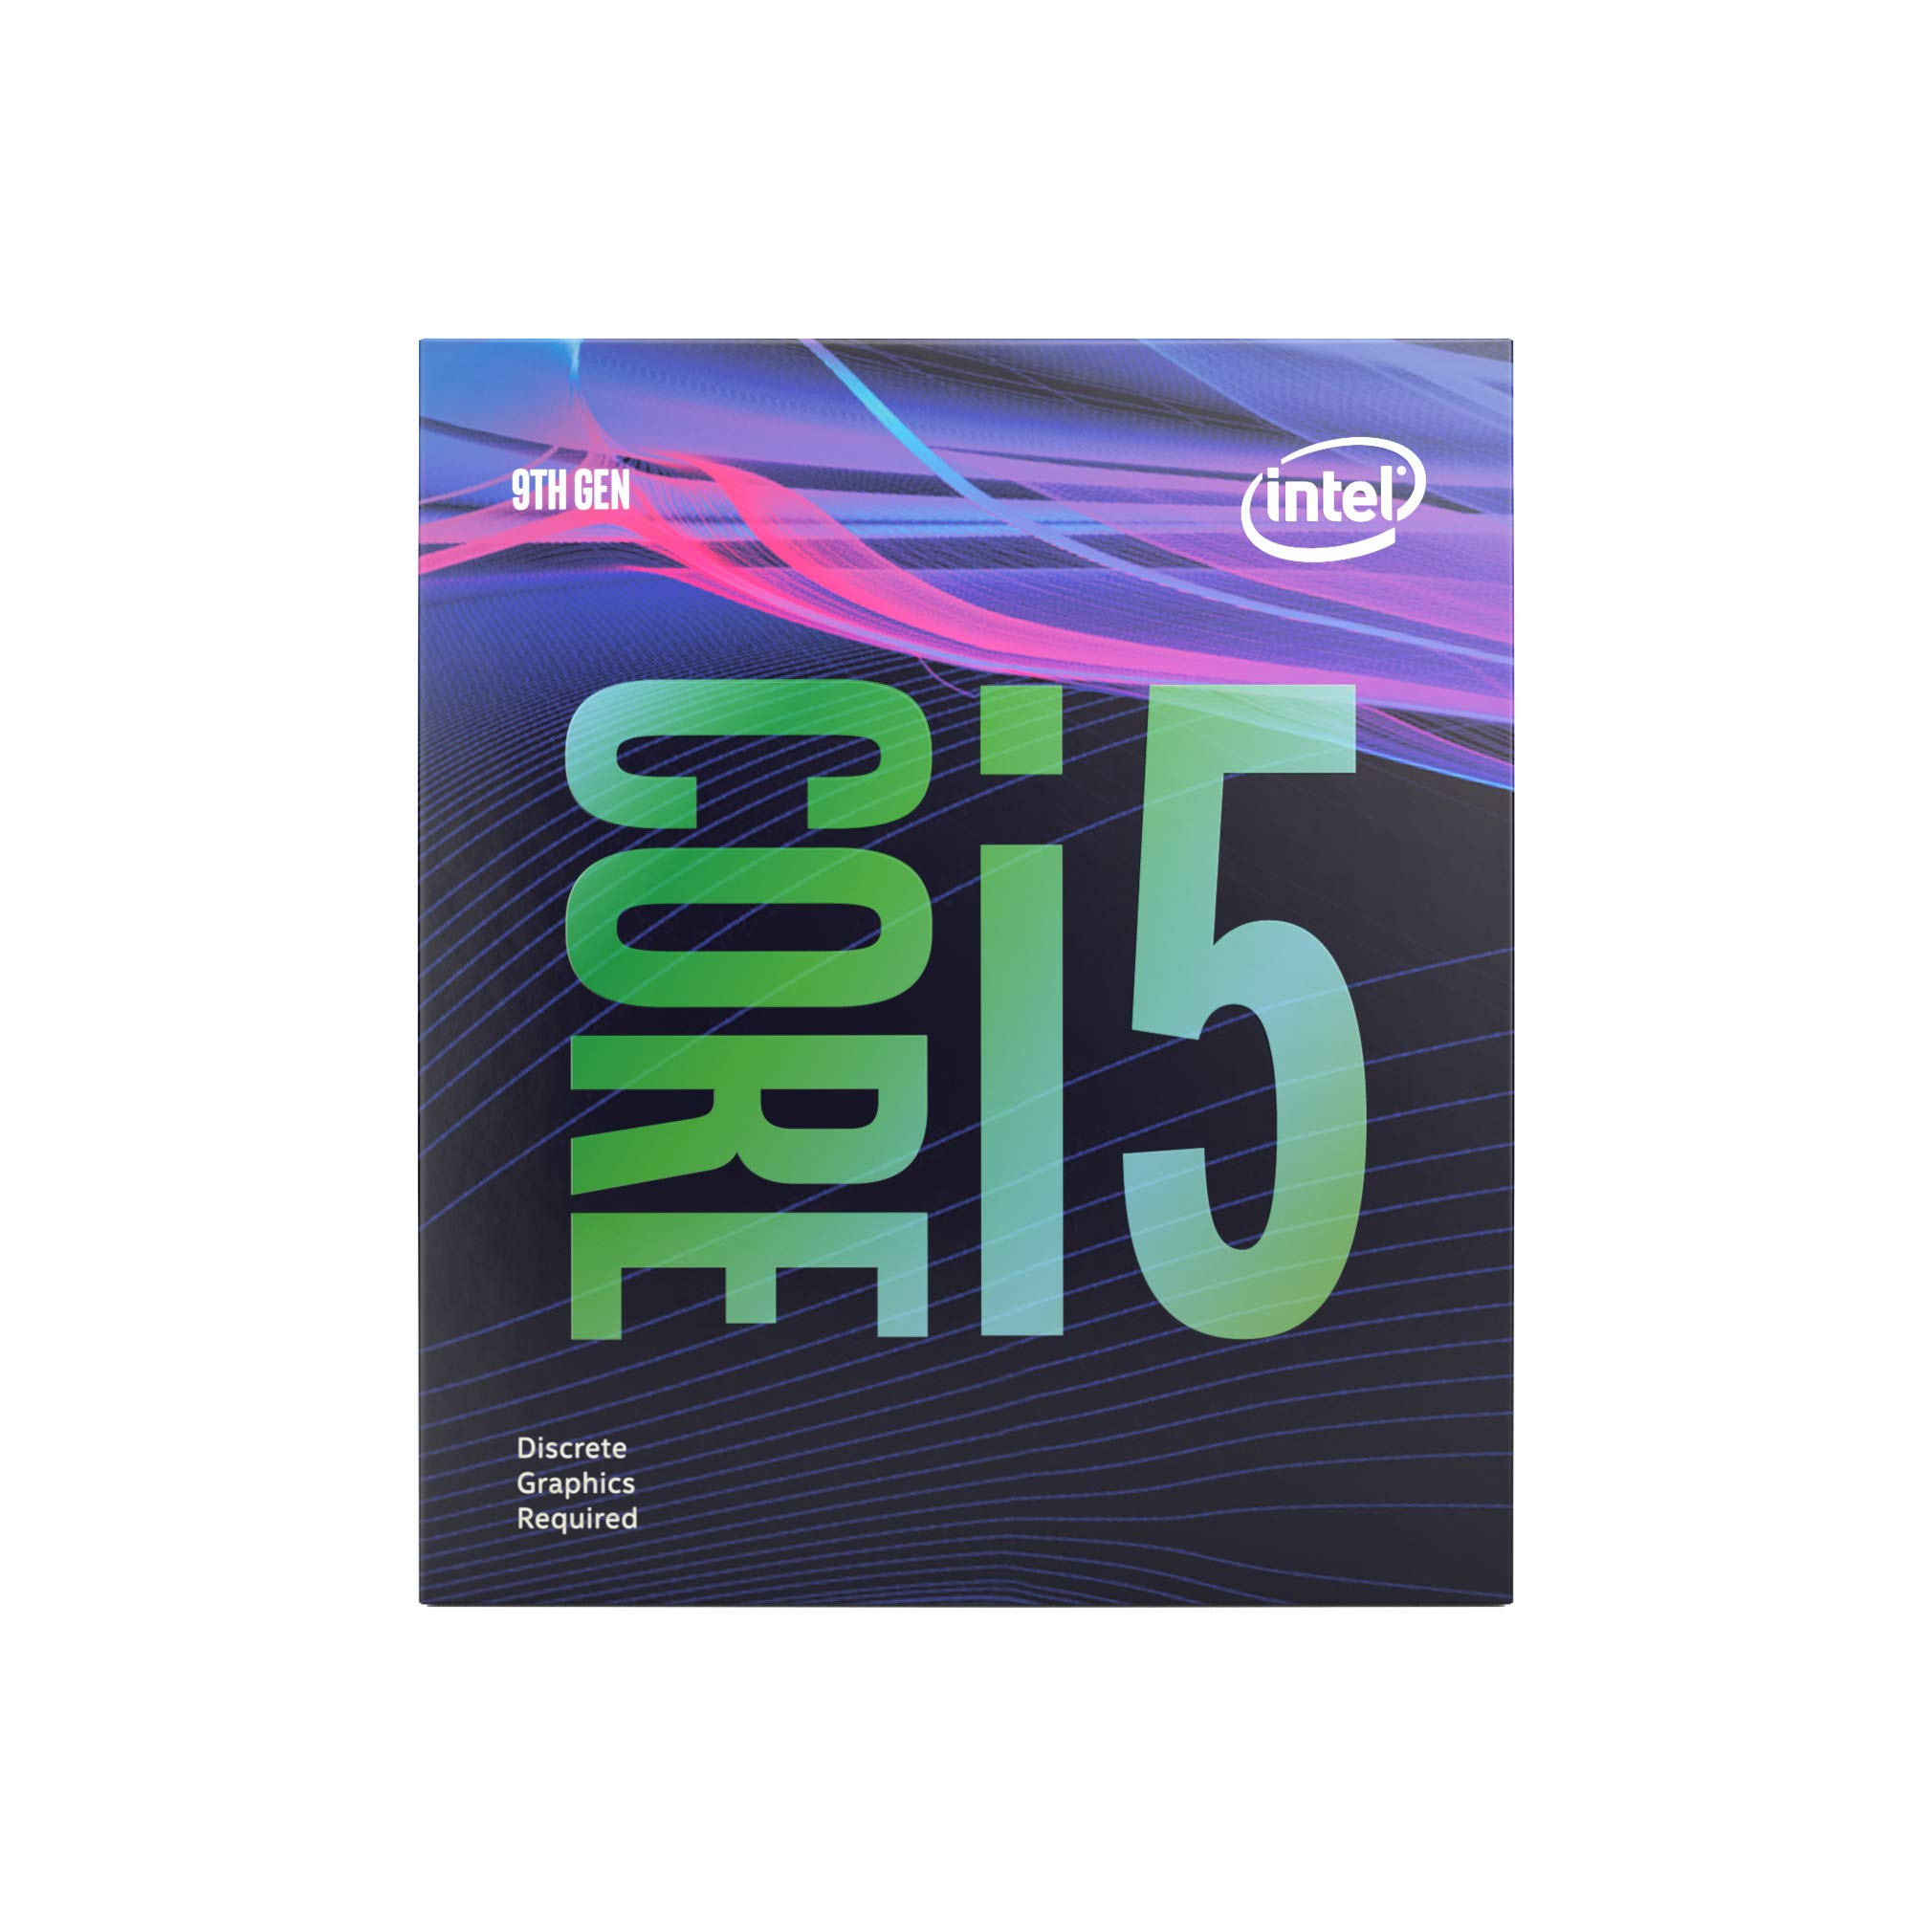 Intel i5-9400F processeur 2.90n2900 9 Mo – Processeurs (2.90 2900, 14 nm, 9th Generation Intel Core i5 Processors, 9 Mo, 4.10 4100, DMI3)